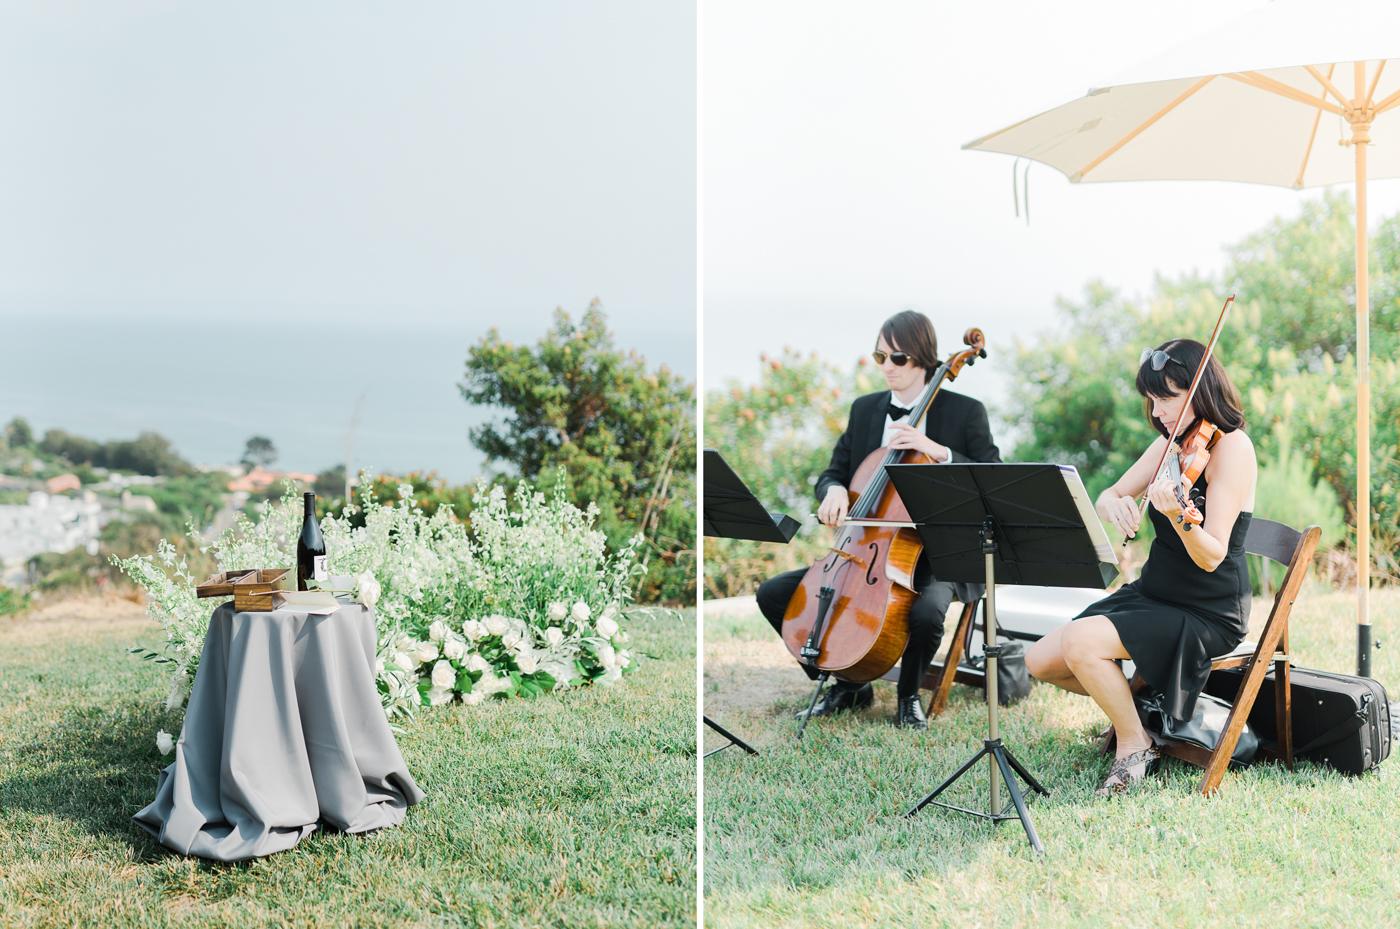 AKP_S&F_Malibu_Wedding_Fine_Art_Photography_Los_Angeles-13_ceremony.jpg